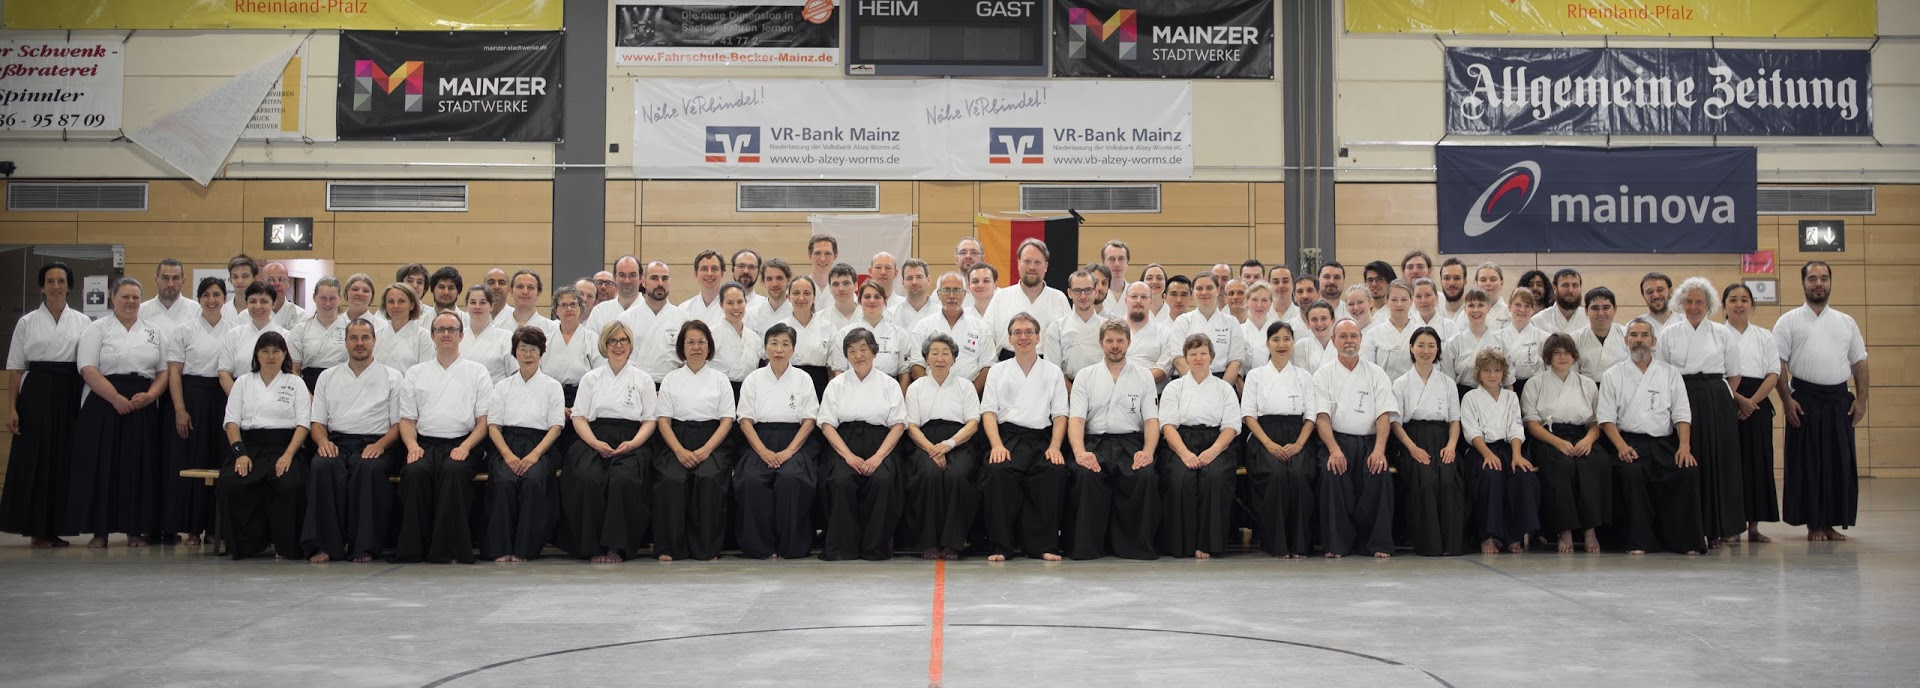 INF Seminar 2017 in Mainz